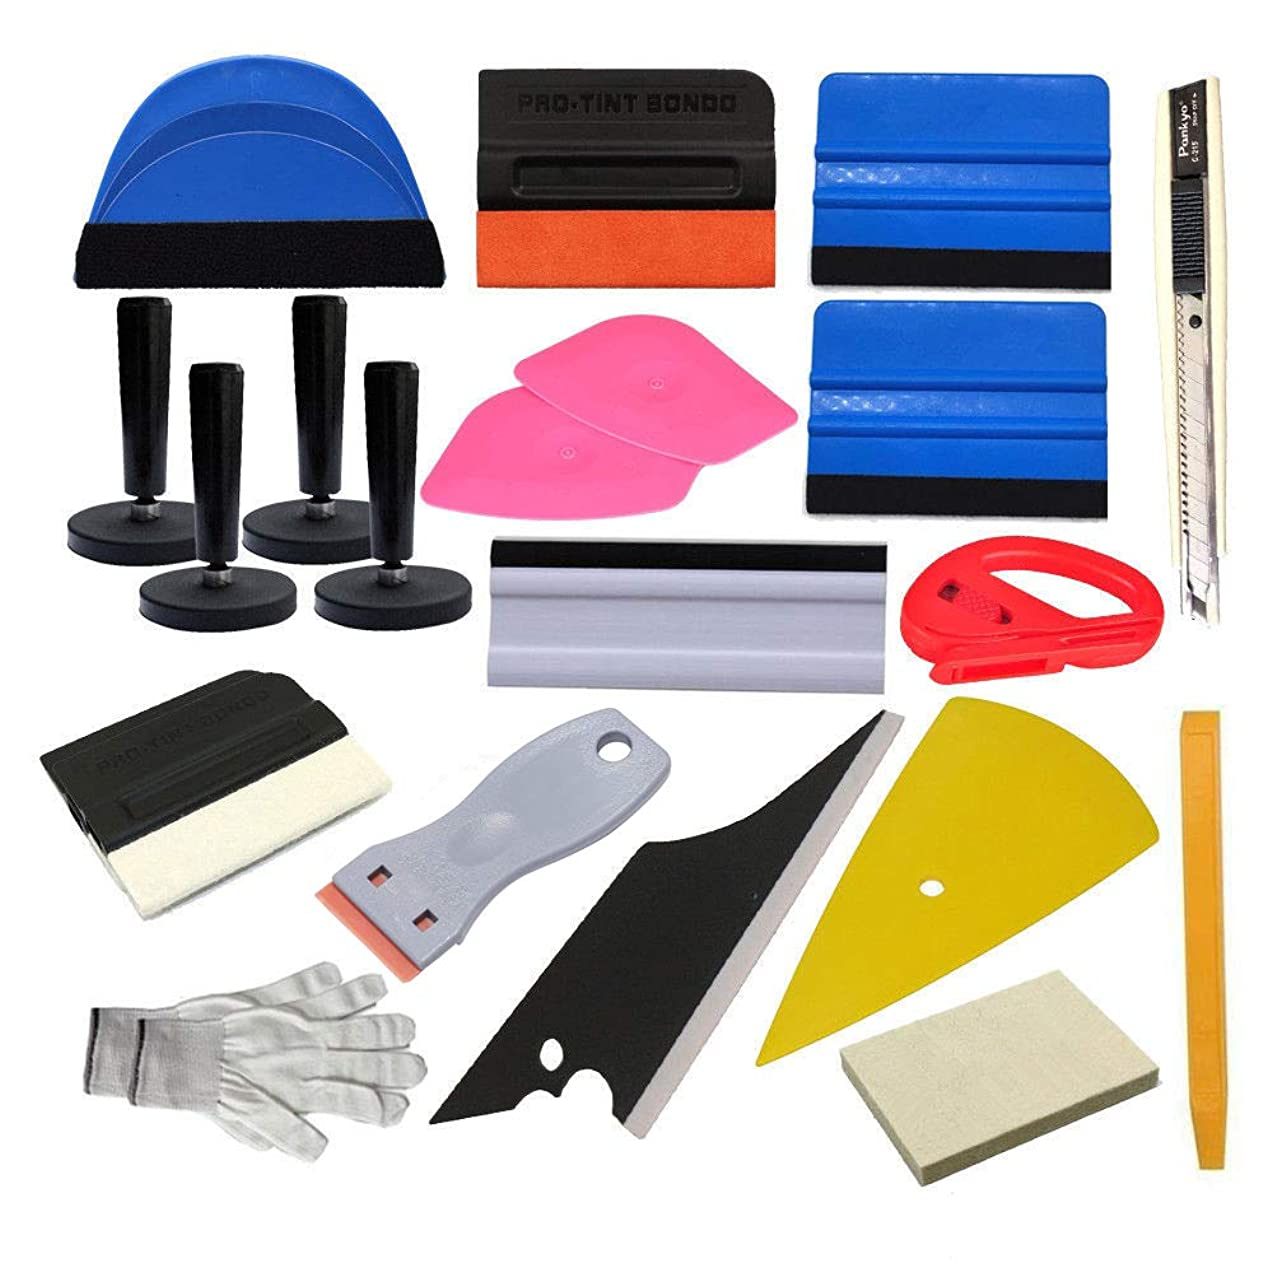 CARLAS Car Vinyl Wrap Tool Window Tint Kit for Vinyl Film Tinting Scraper Application